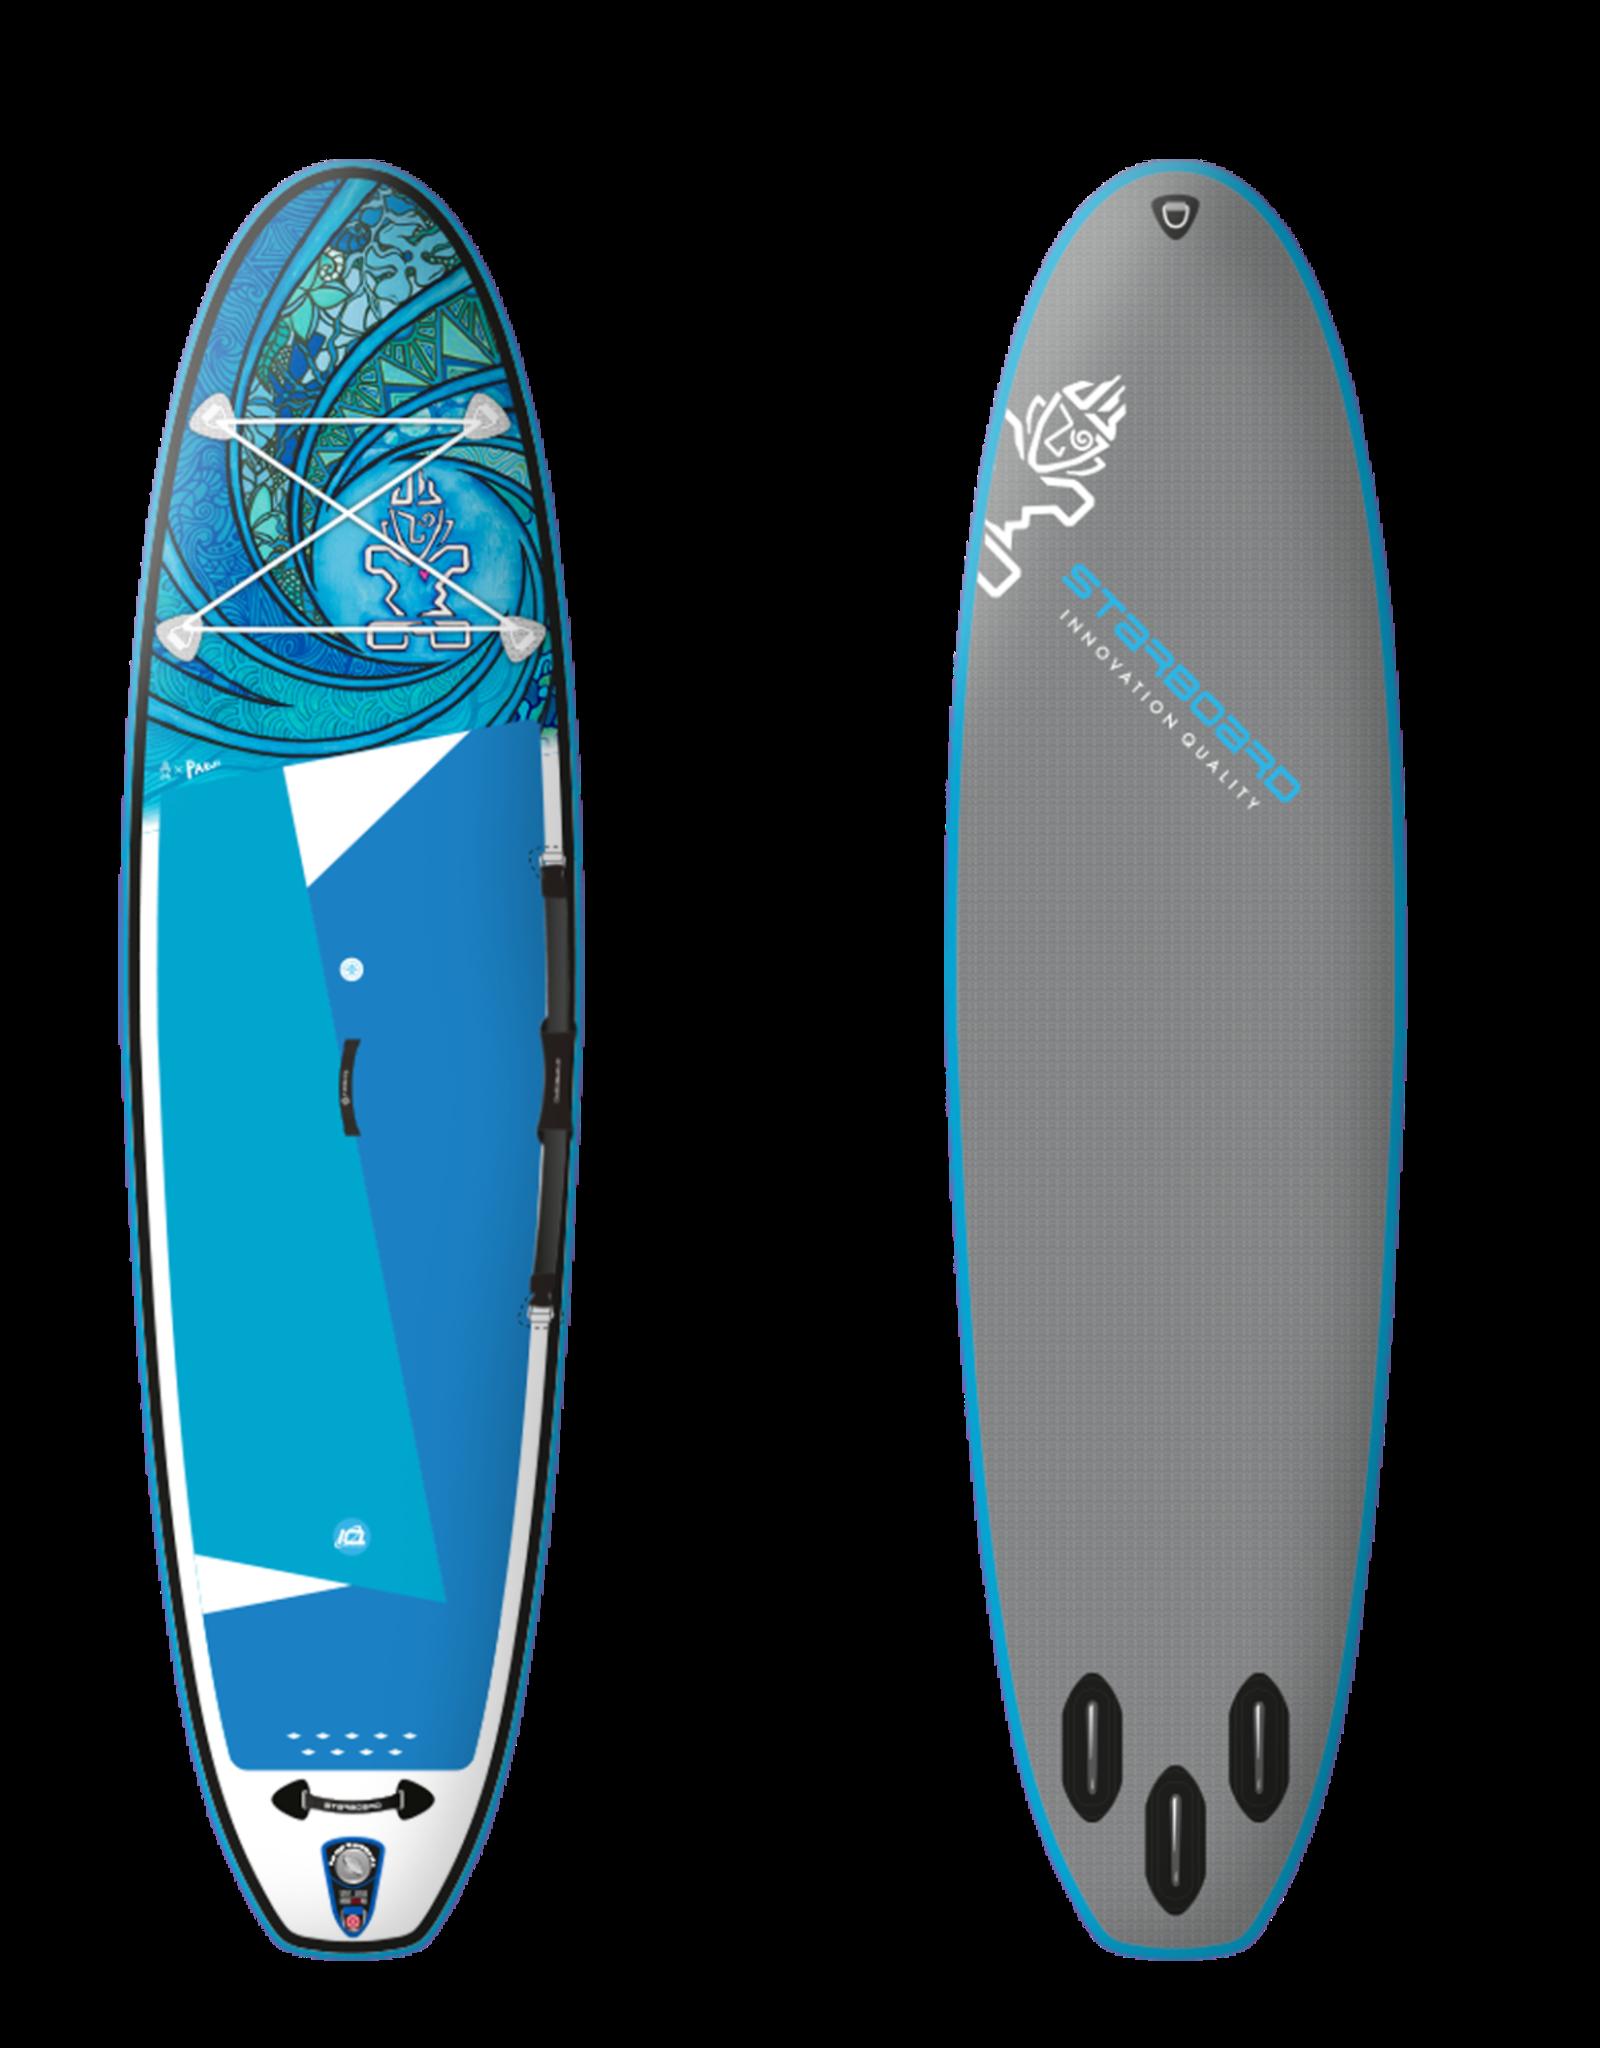 "Starboard 2021 Starboard Inflatable SUP 10'2x31""x4.75"" iGO (Tikhine) Wave Deluxe SC"